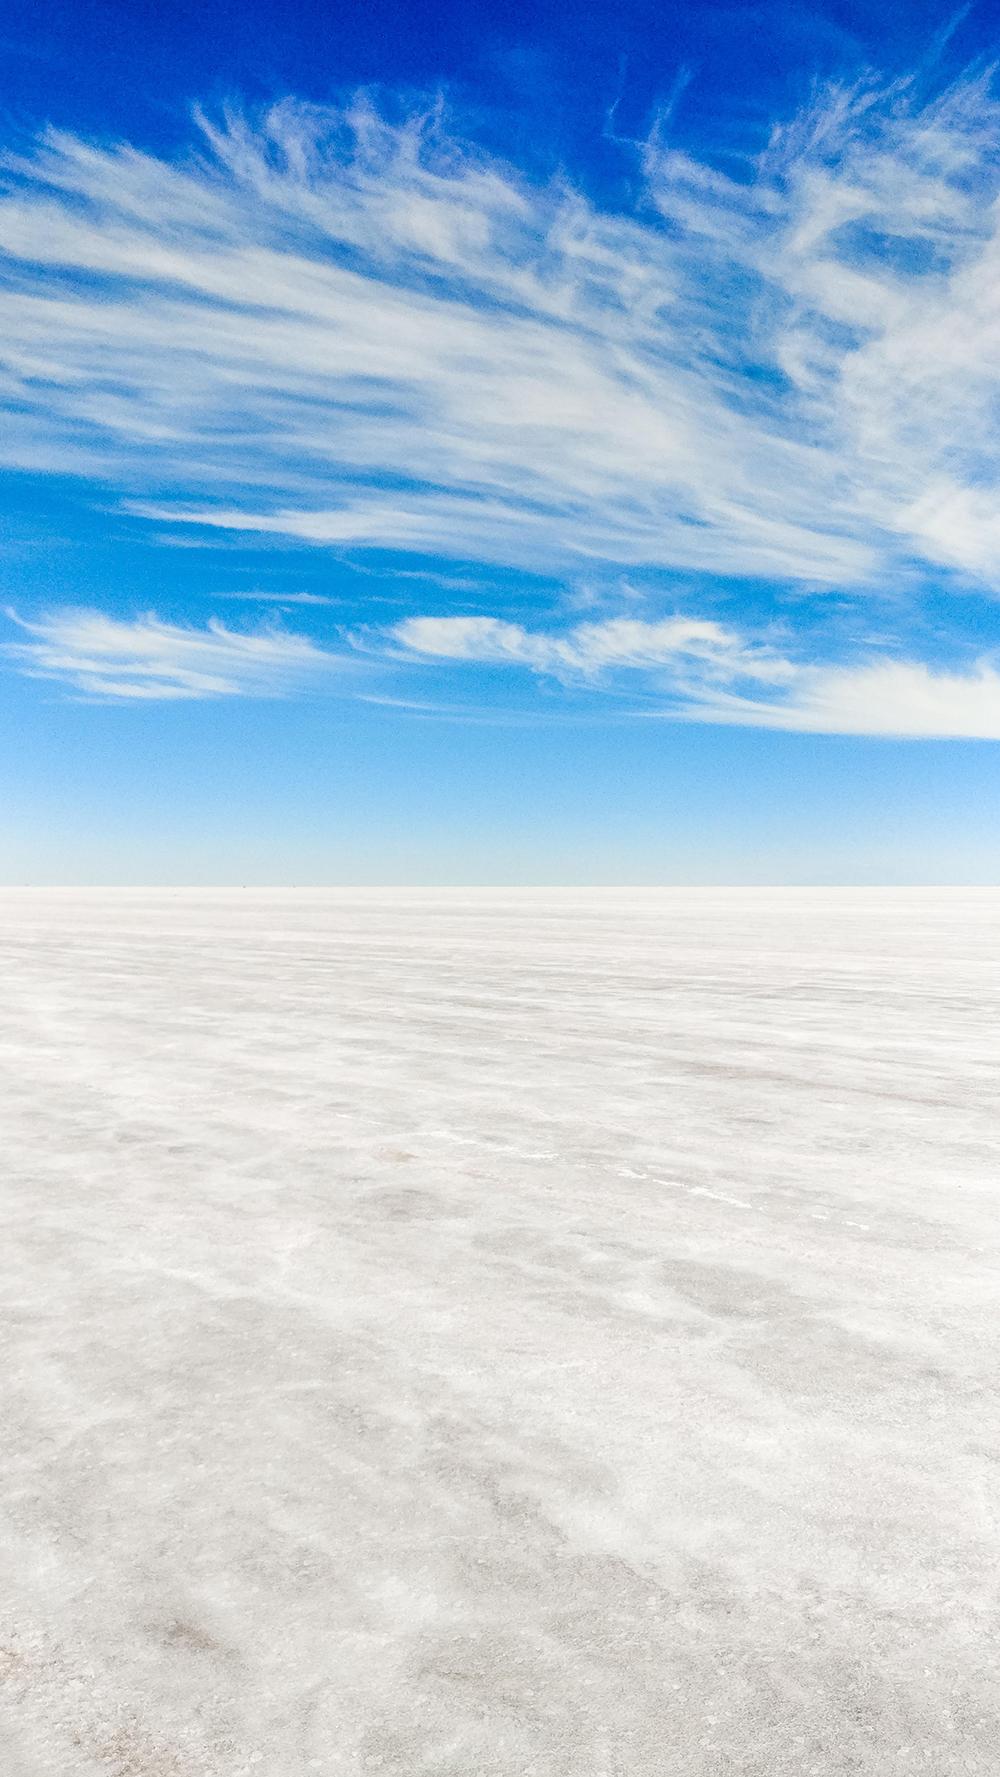 Salar de Uyuni - How to pick the best Uyuni Salt Flats tour to Bolivia? | Aliz's Wonderland